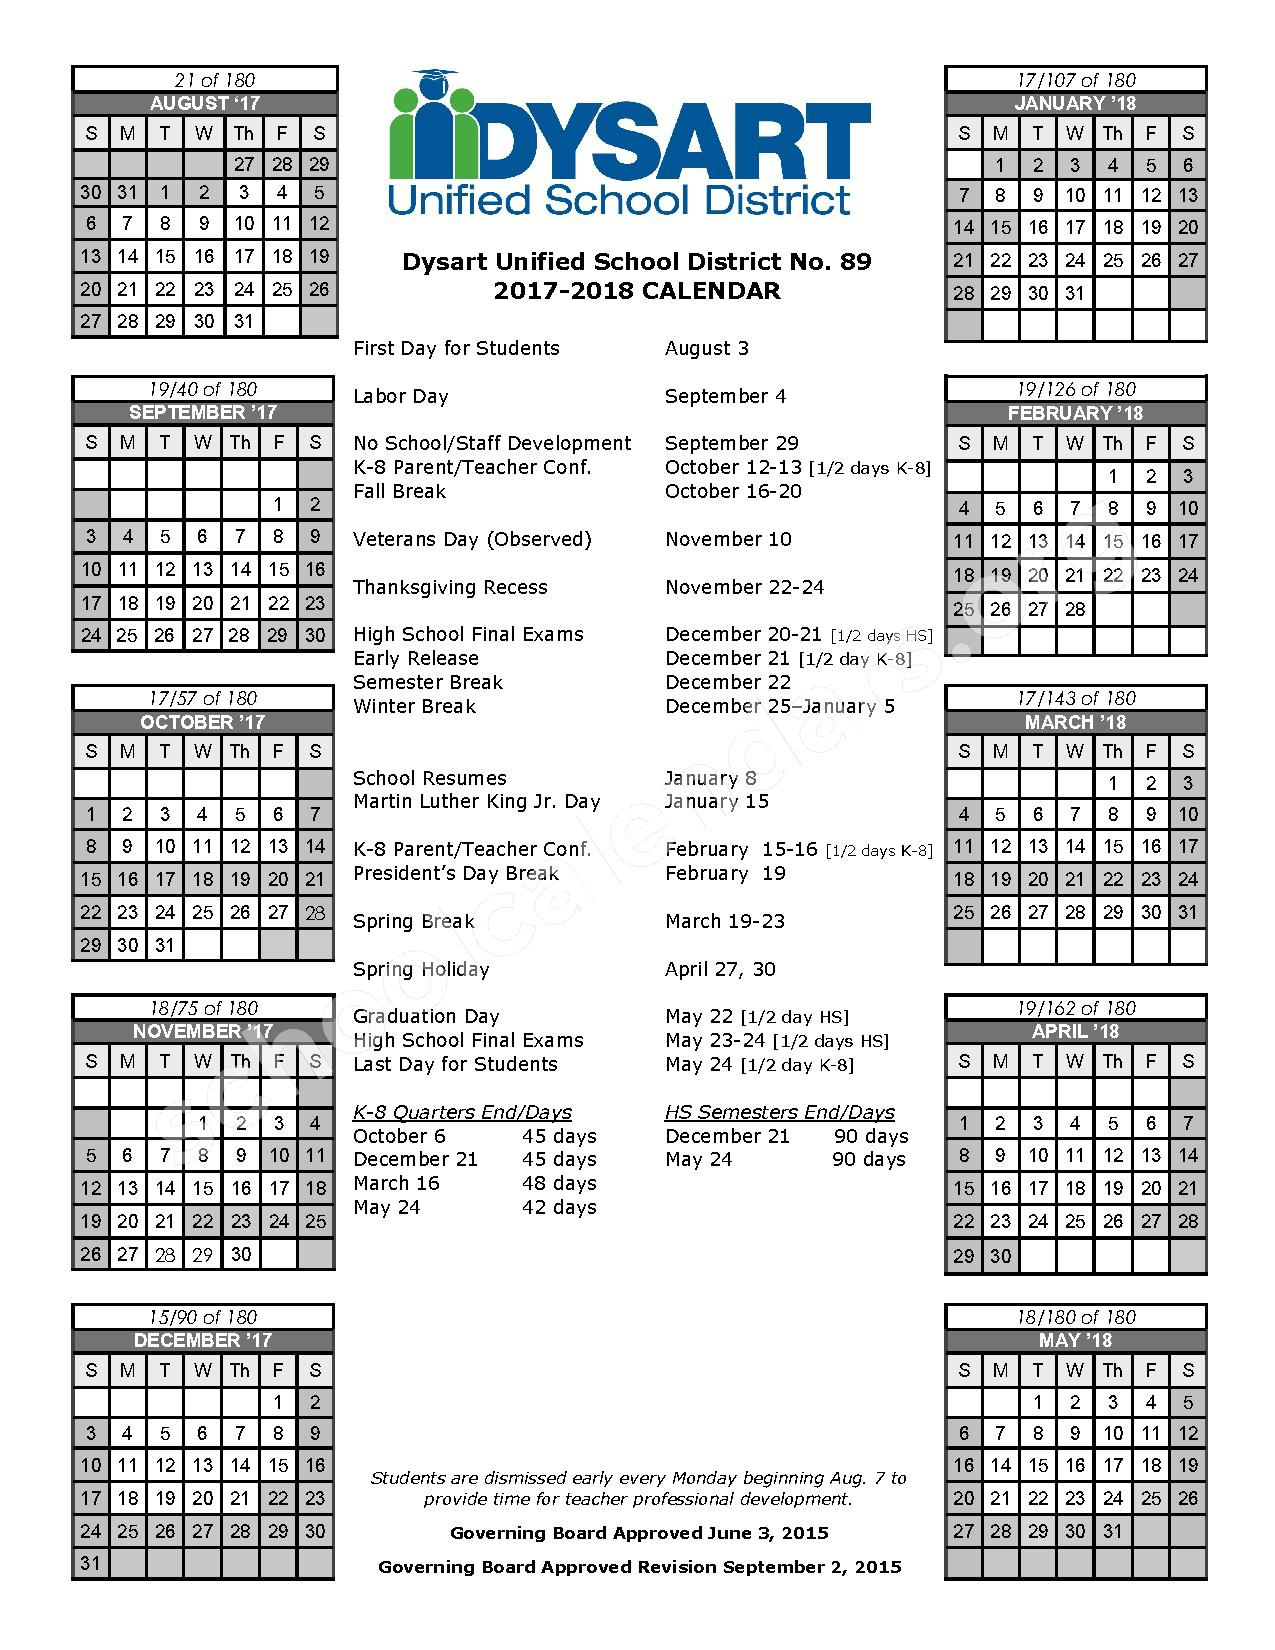 Dysart Unified School District #89 Calendars - Surprise, Az with 2022 2023 Altoona Area School District Calendar